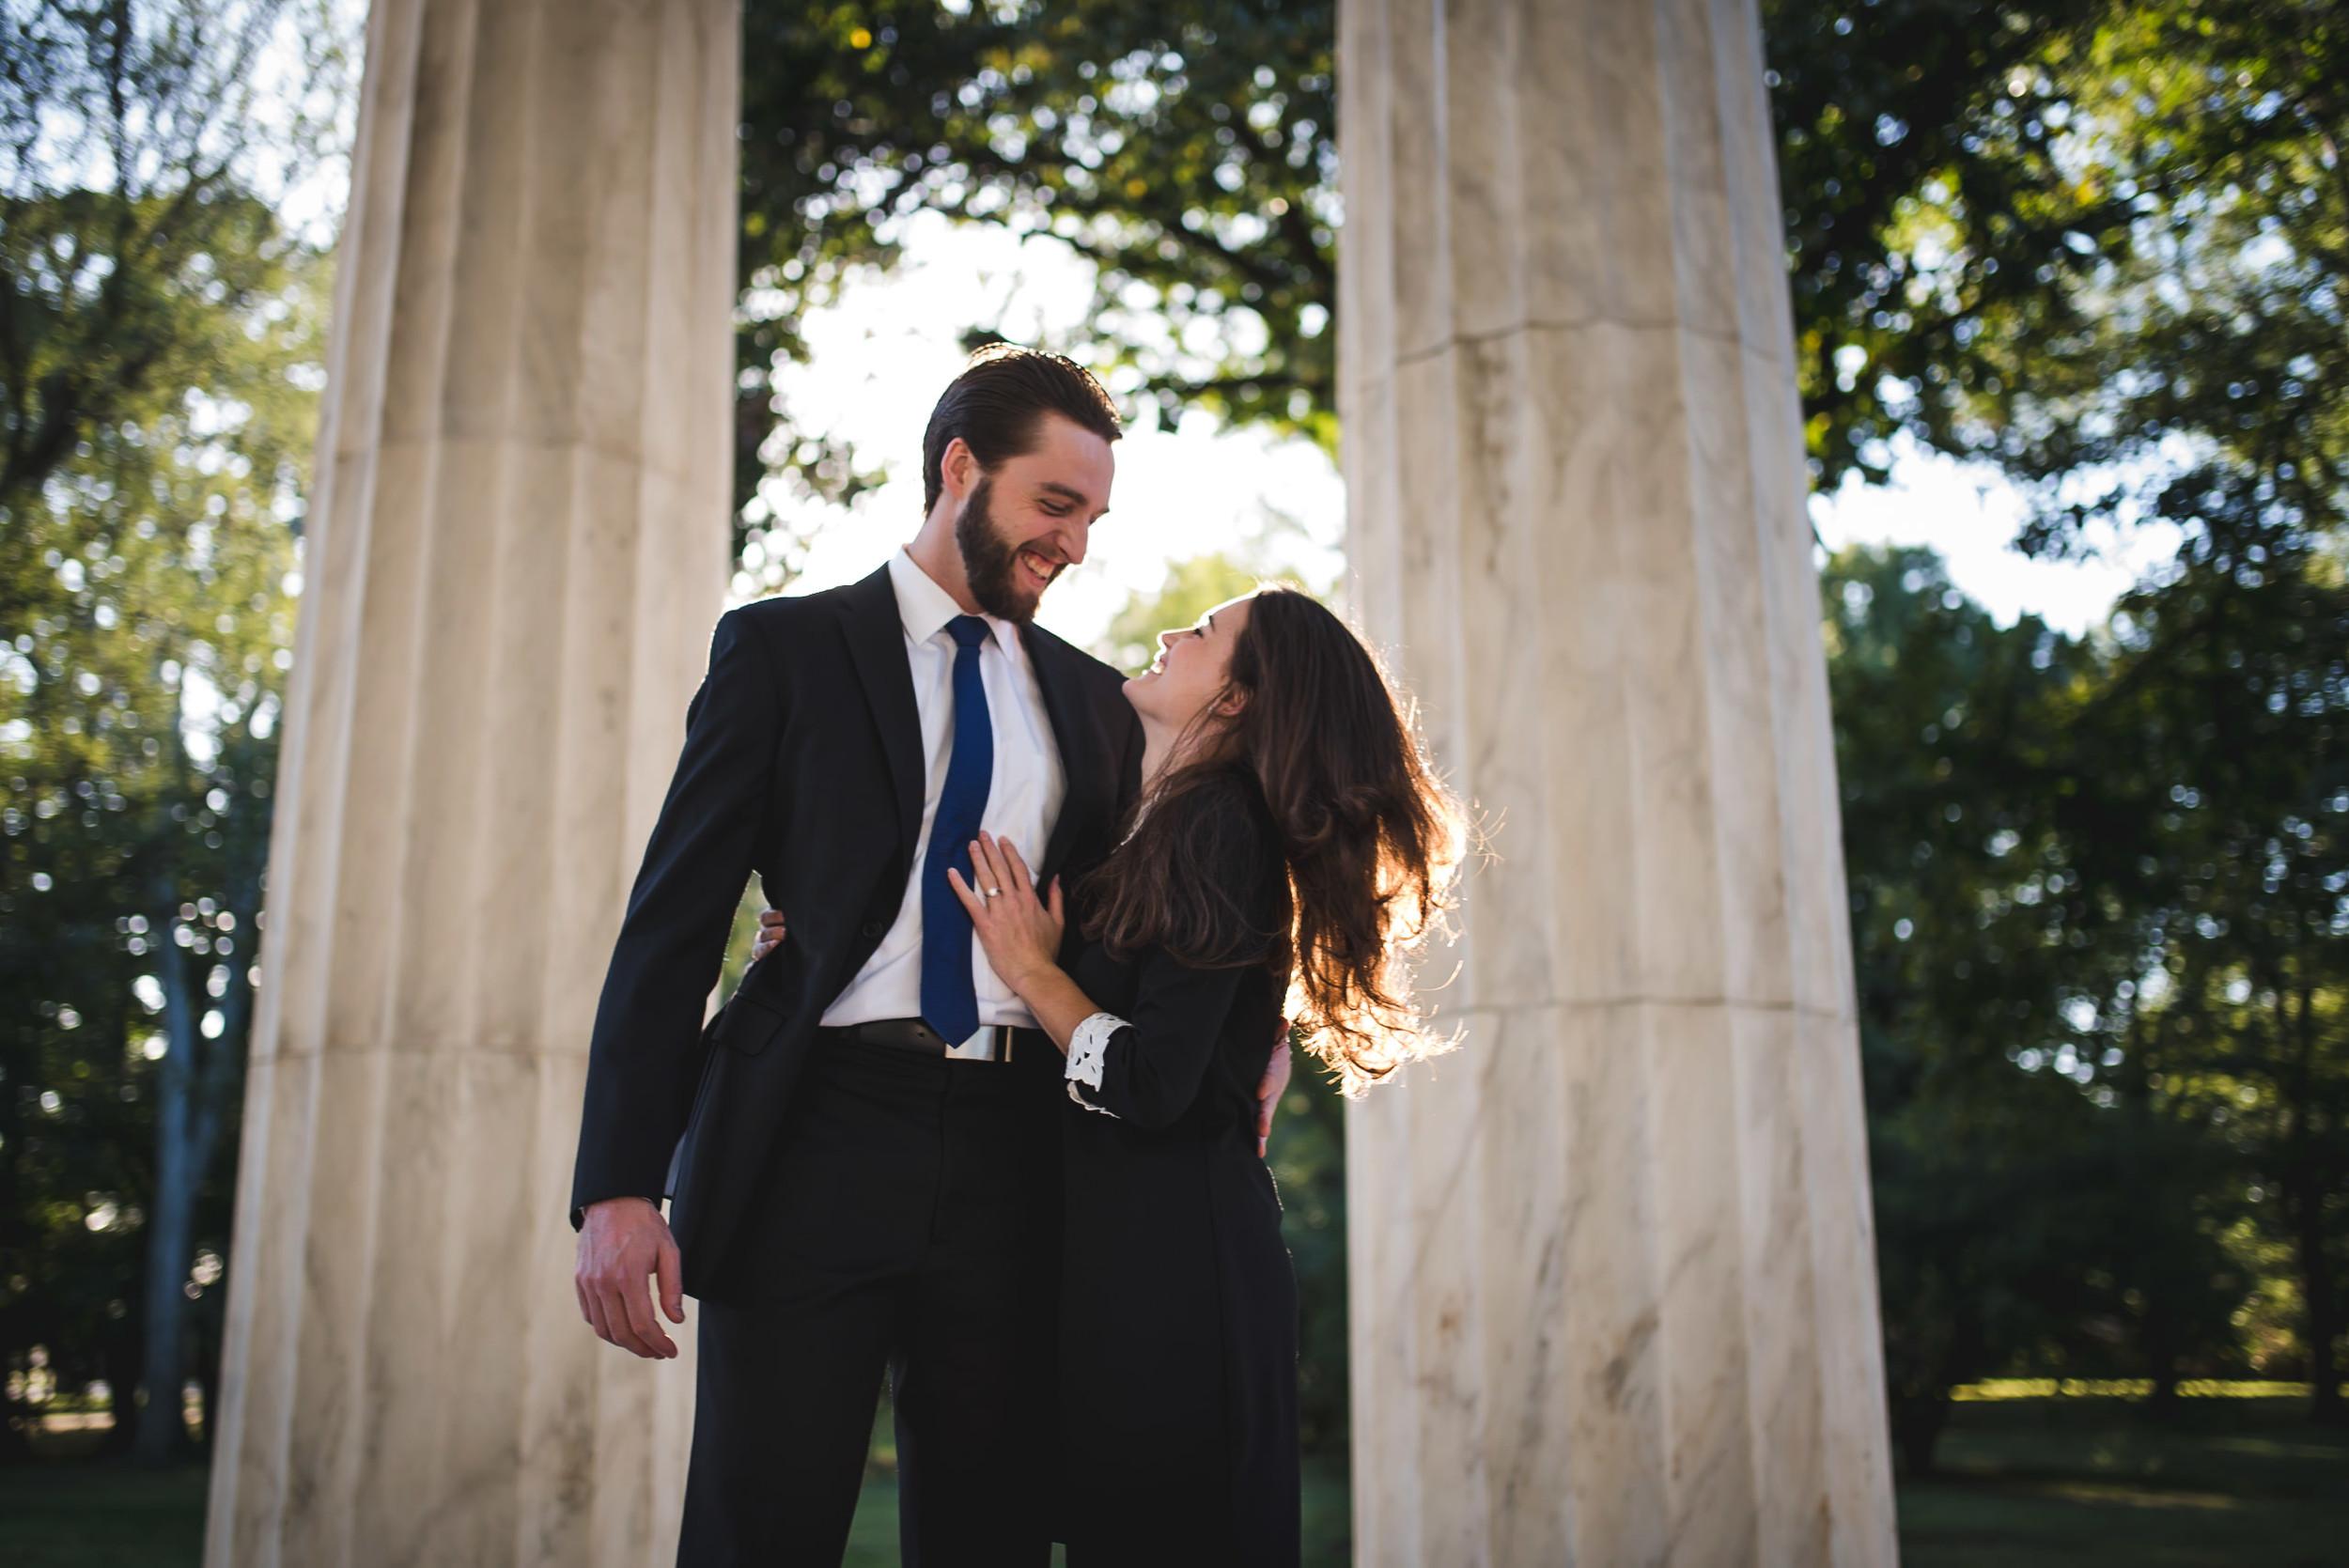 best engagement photographers washington dc Mantas Kubilinskas-2.jpg